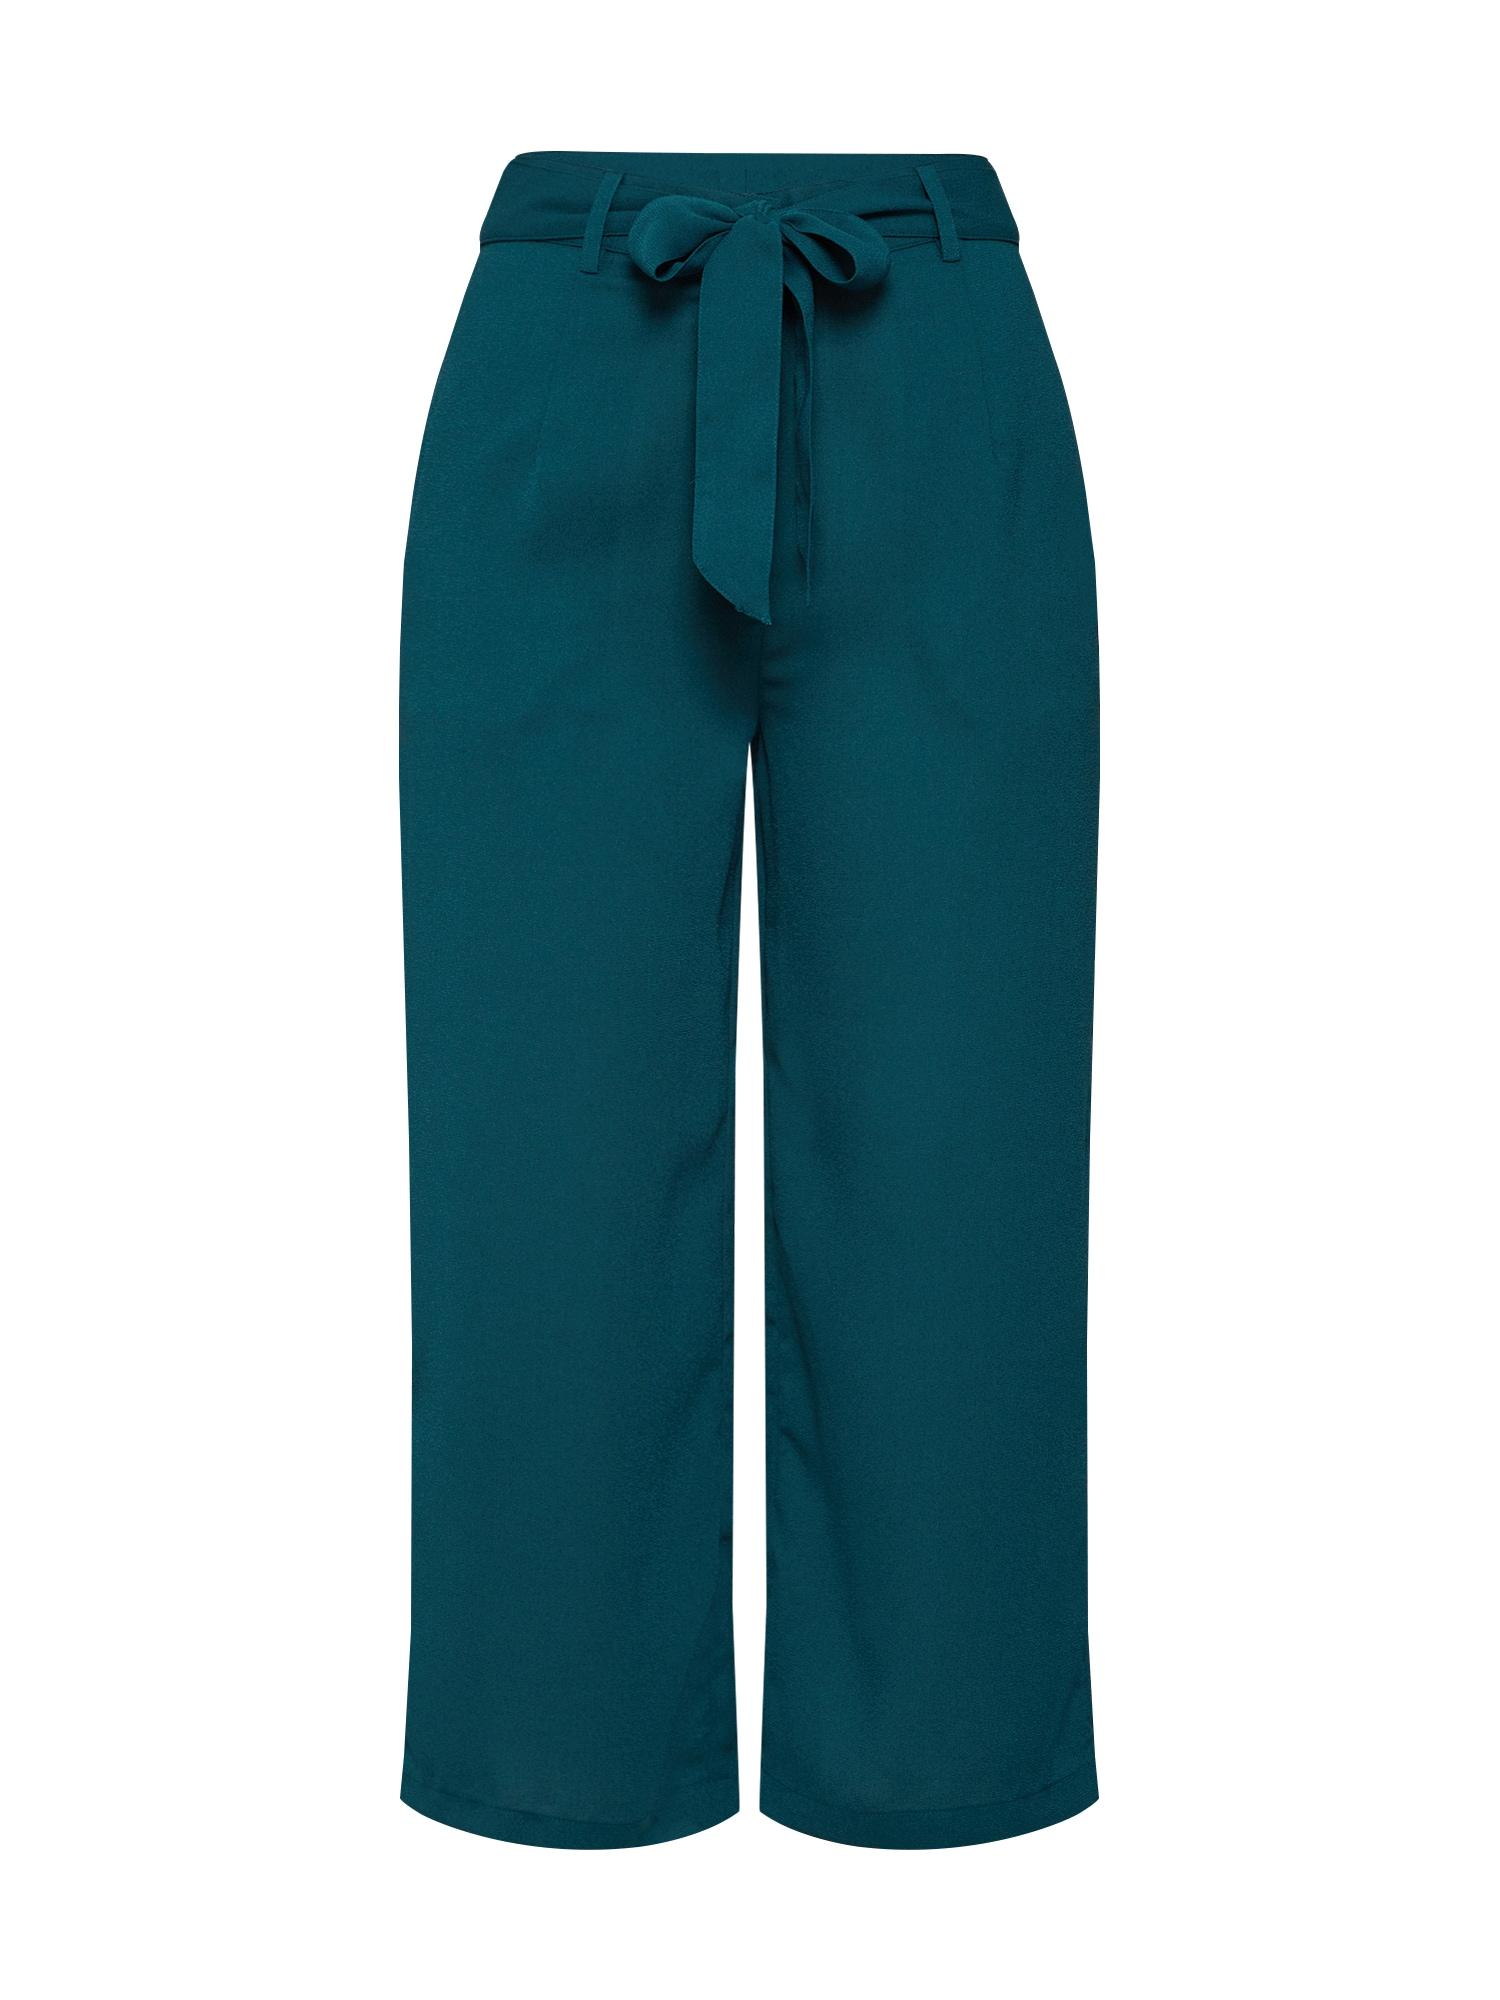 ABOUT YOU Kelnės 'Ayla' tamsiai žalia